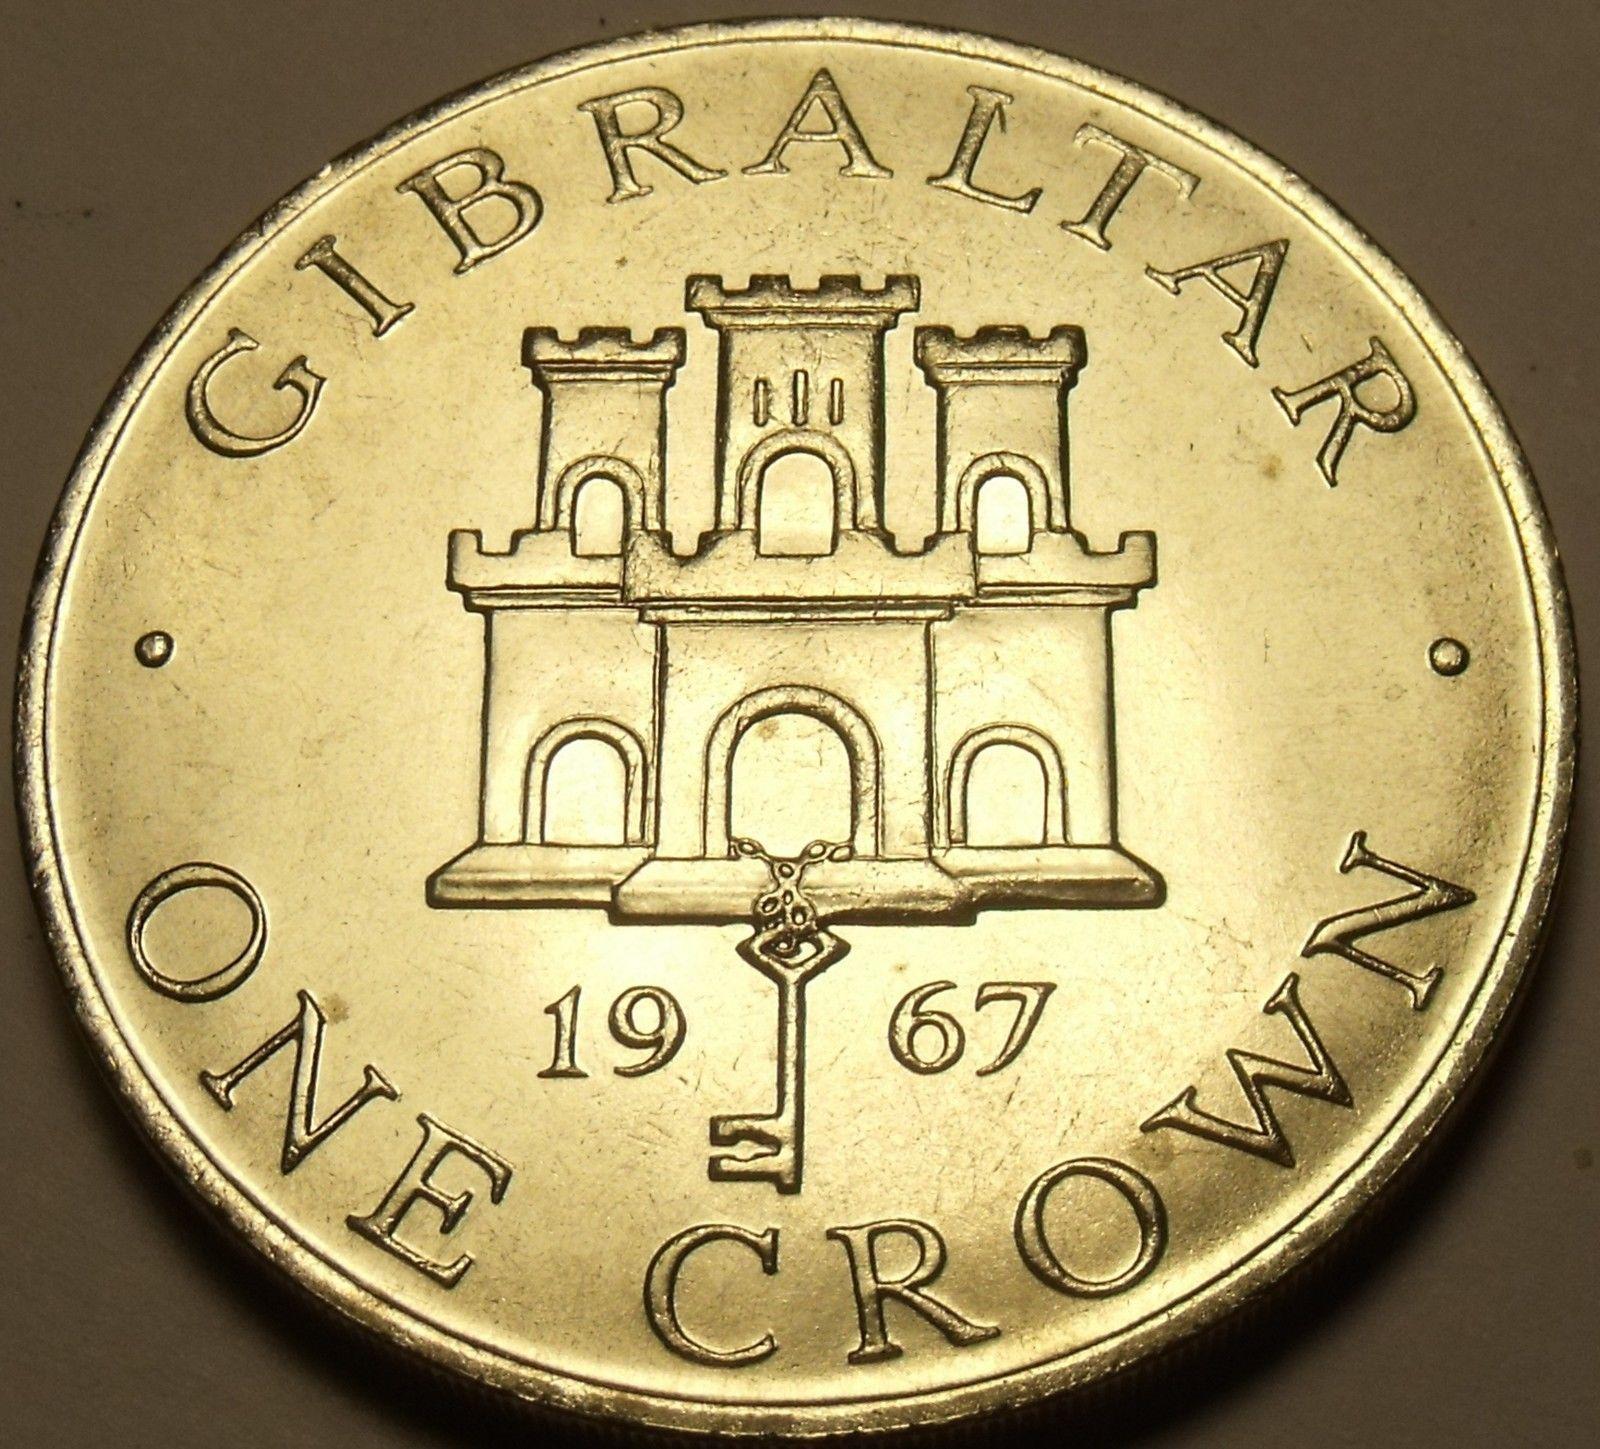 Rare Silver Proof Panama 1967 Half Balboa~19,983 Minted